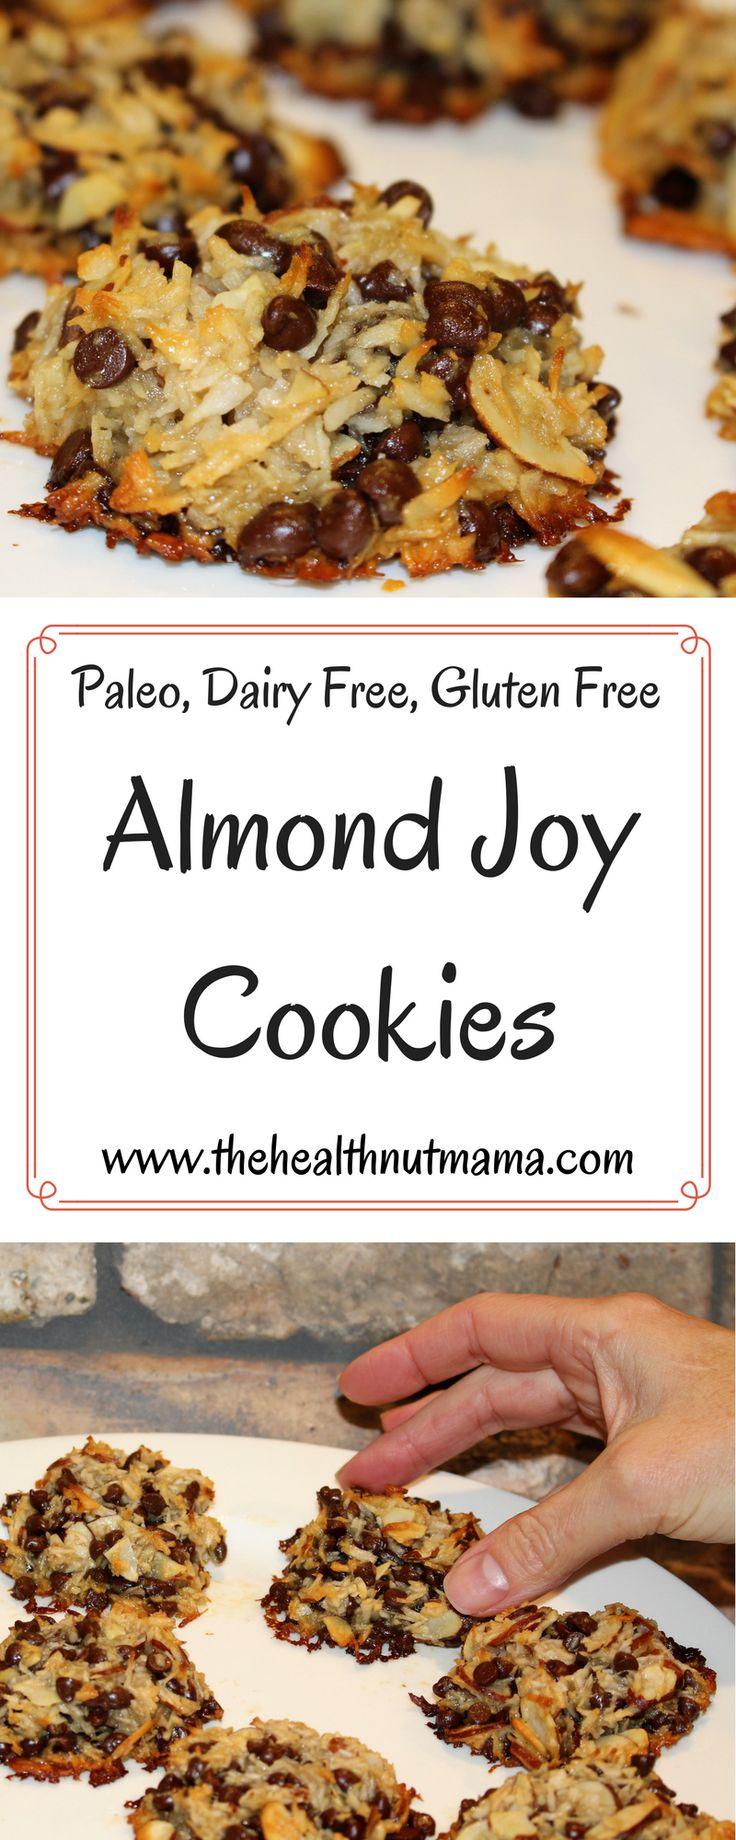 Paleo Almond Joy Cookies (Gluten Free, Dairy Free, Soy Free, Egg Free) | www.thehealthnutmama.com